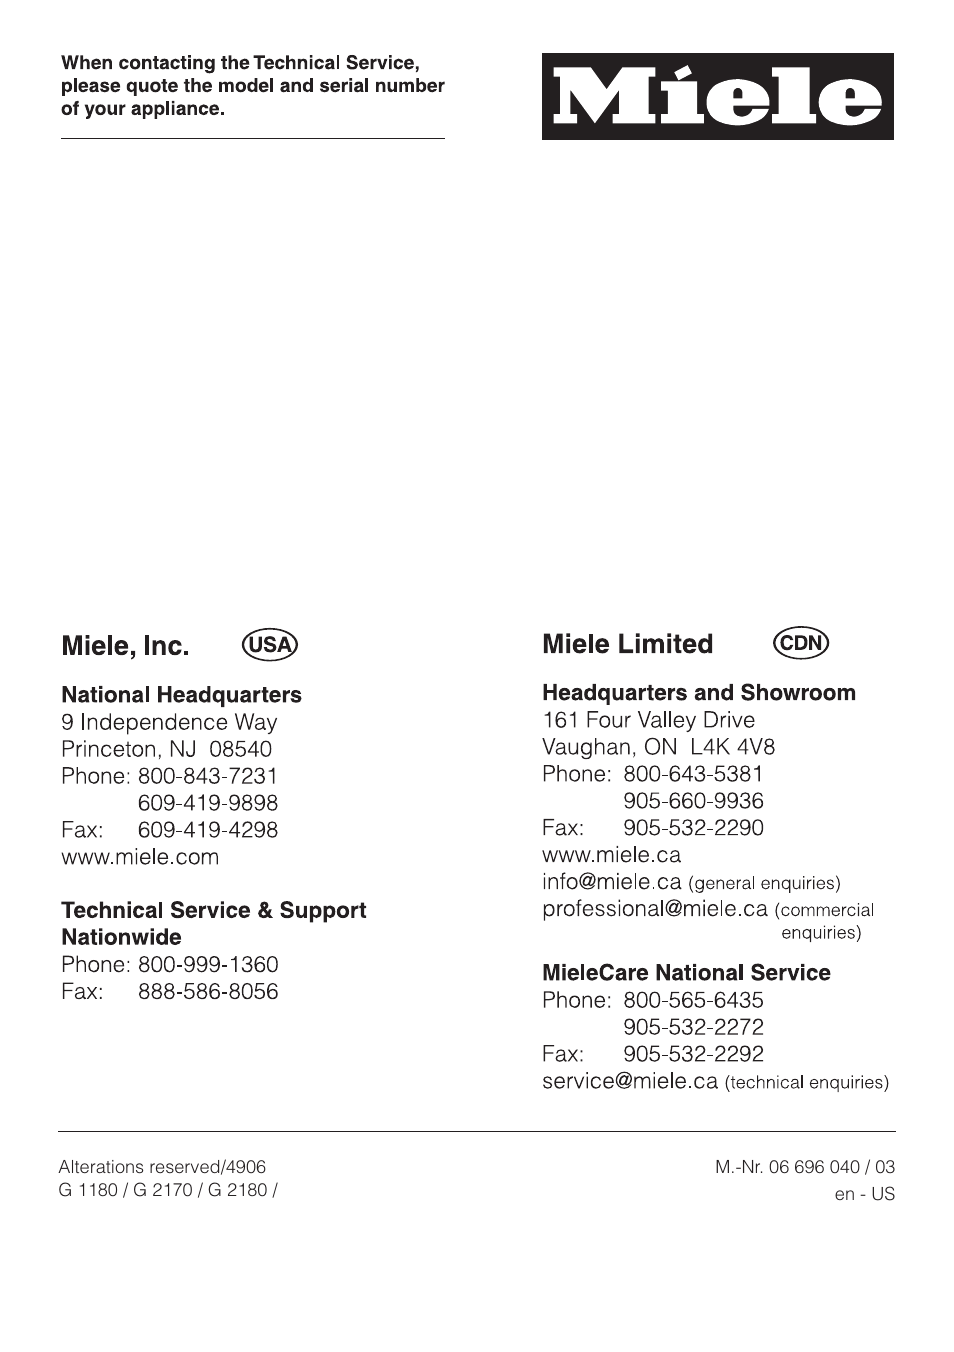 miele g 2170 service manual product user guide instruction u2022 rh testdpc co